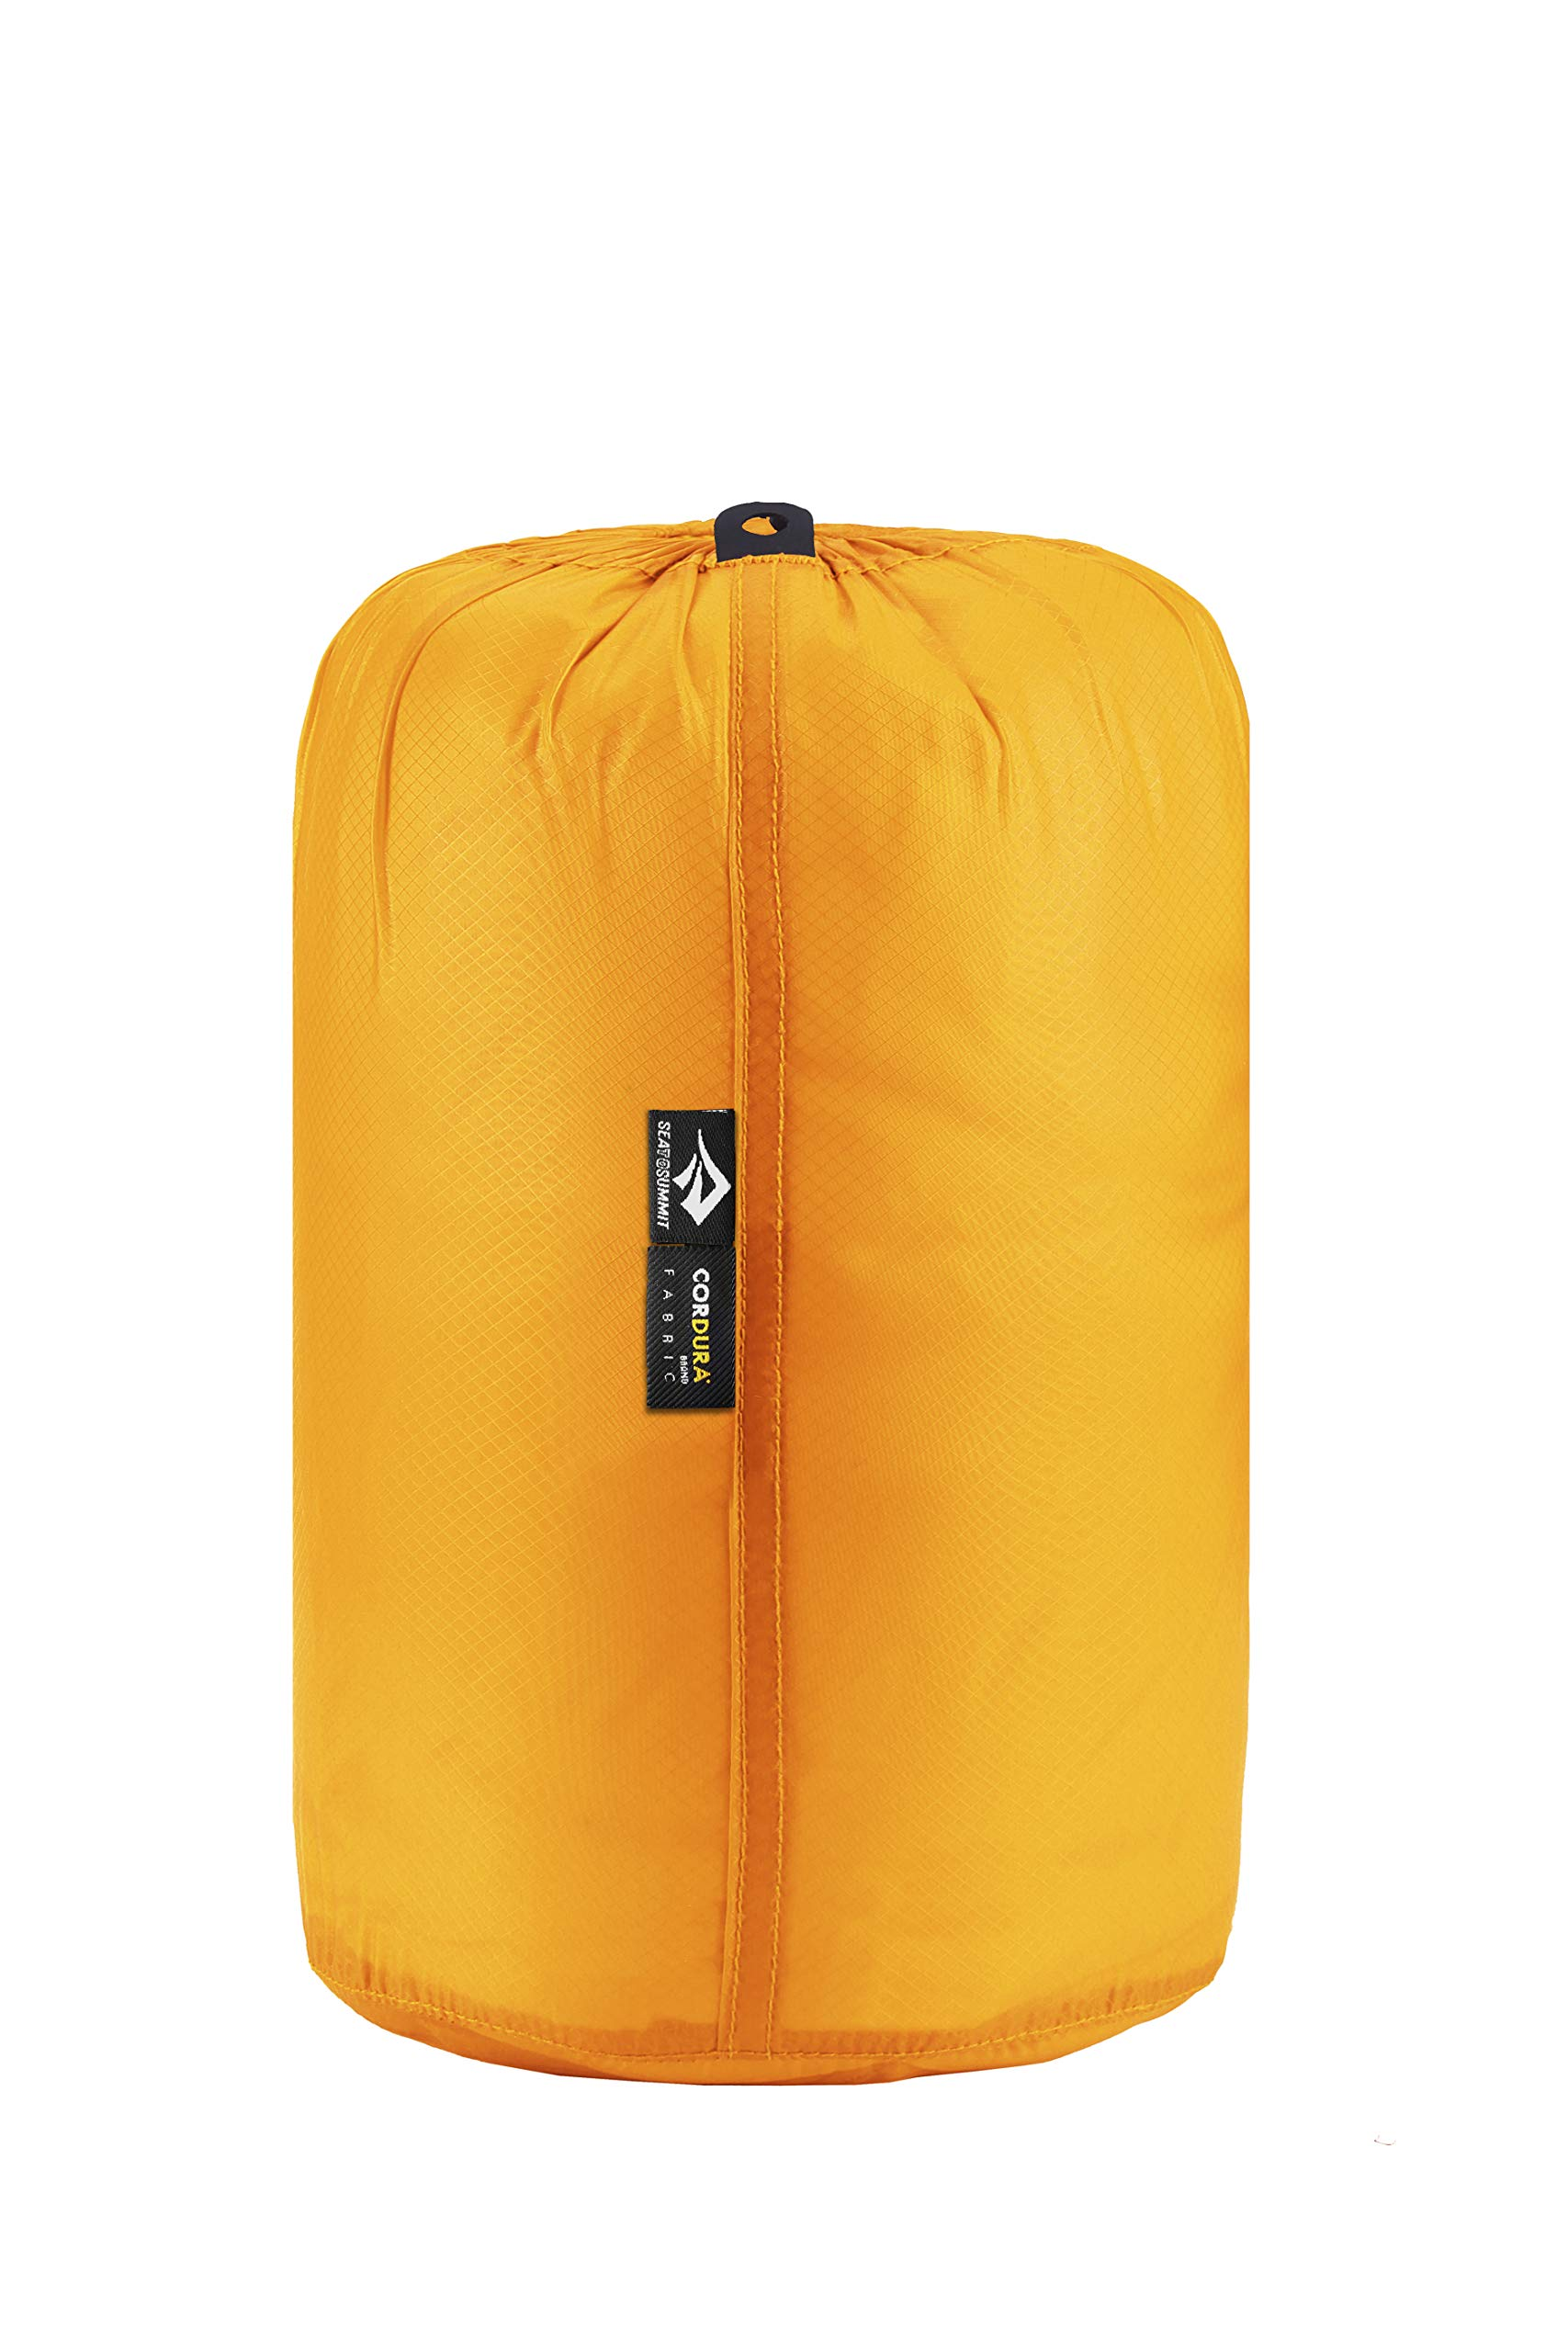 Sea to Summit Ultra-SIL Stuff Sack, Yellow, 15 Liter by Sea to Summit